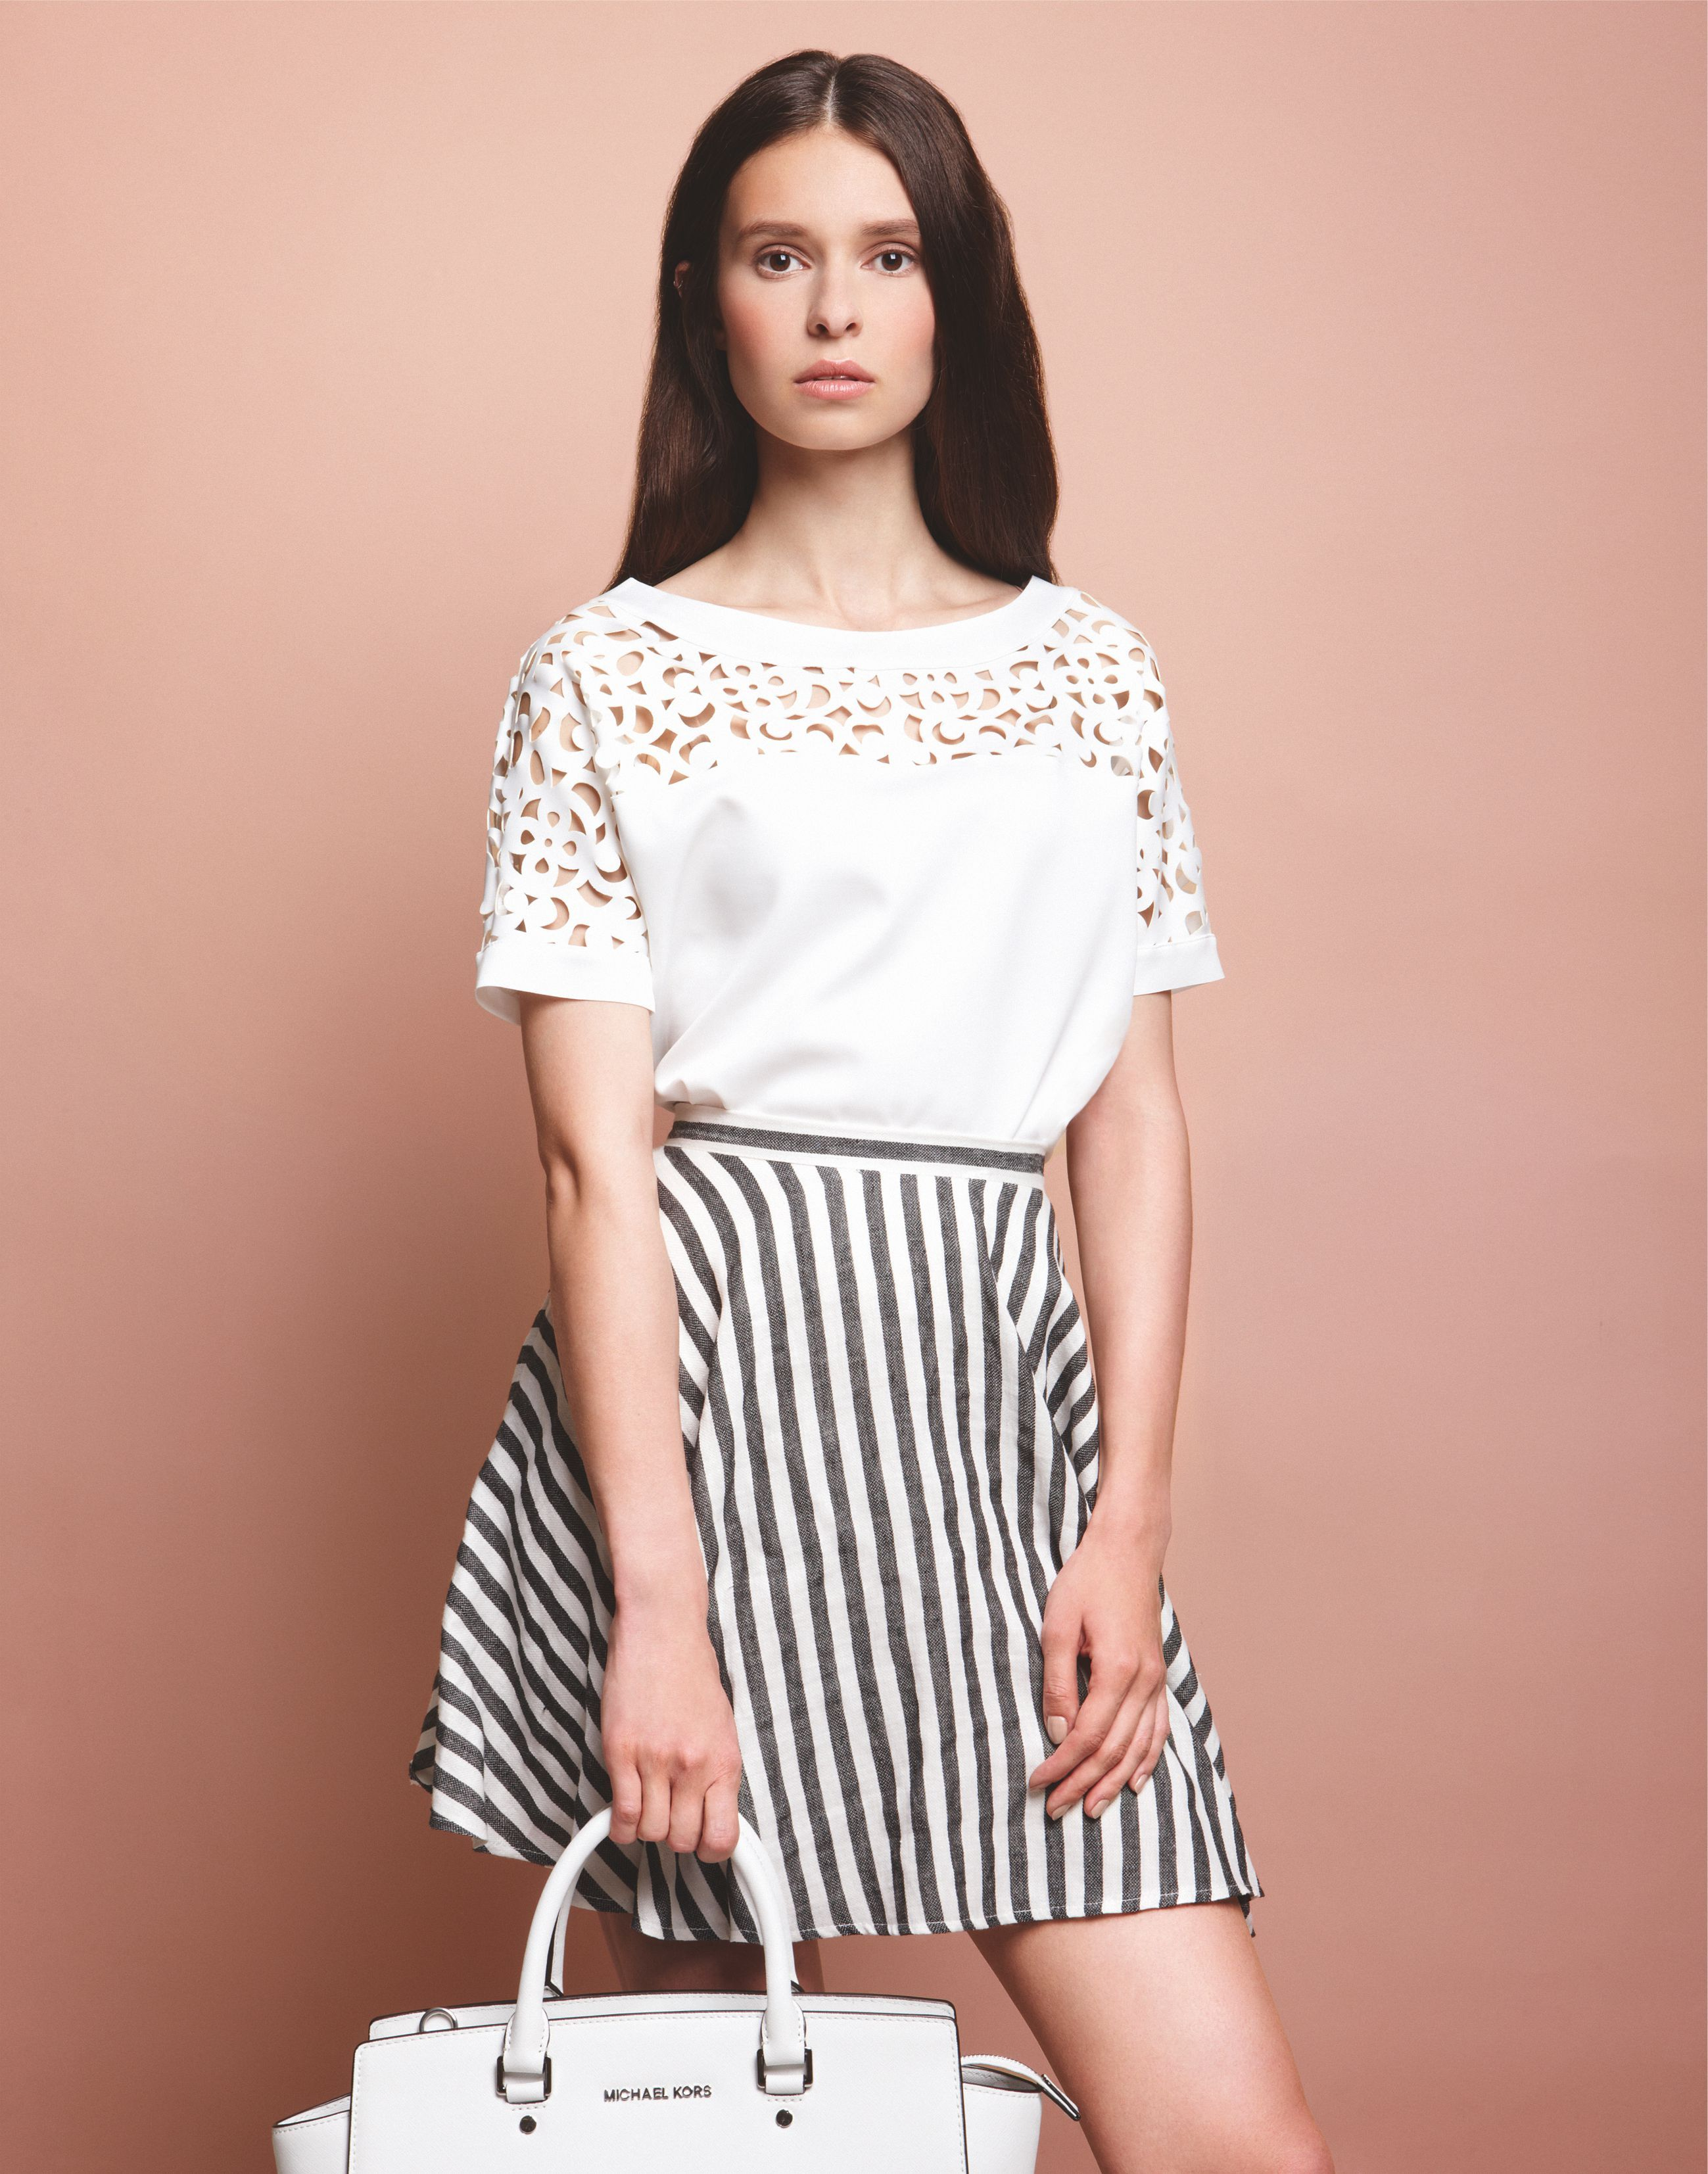 Moderns #lasercut #Shirt trifft den #Klassiker #Streifen - perfektes #Paar für den #Sommer